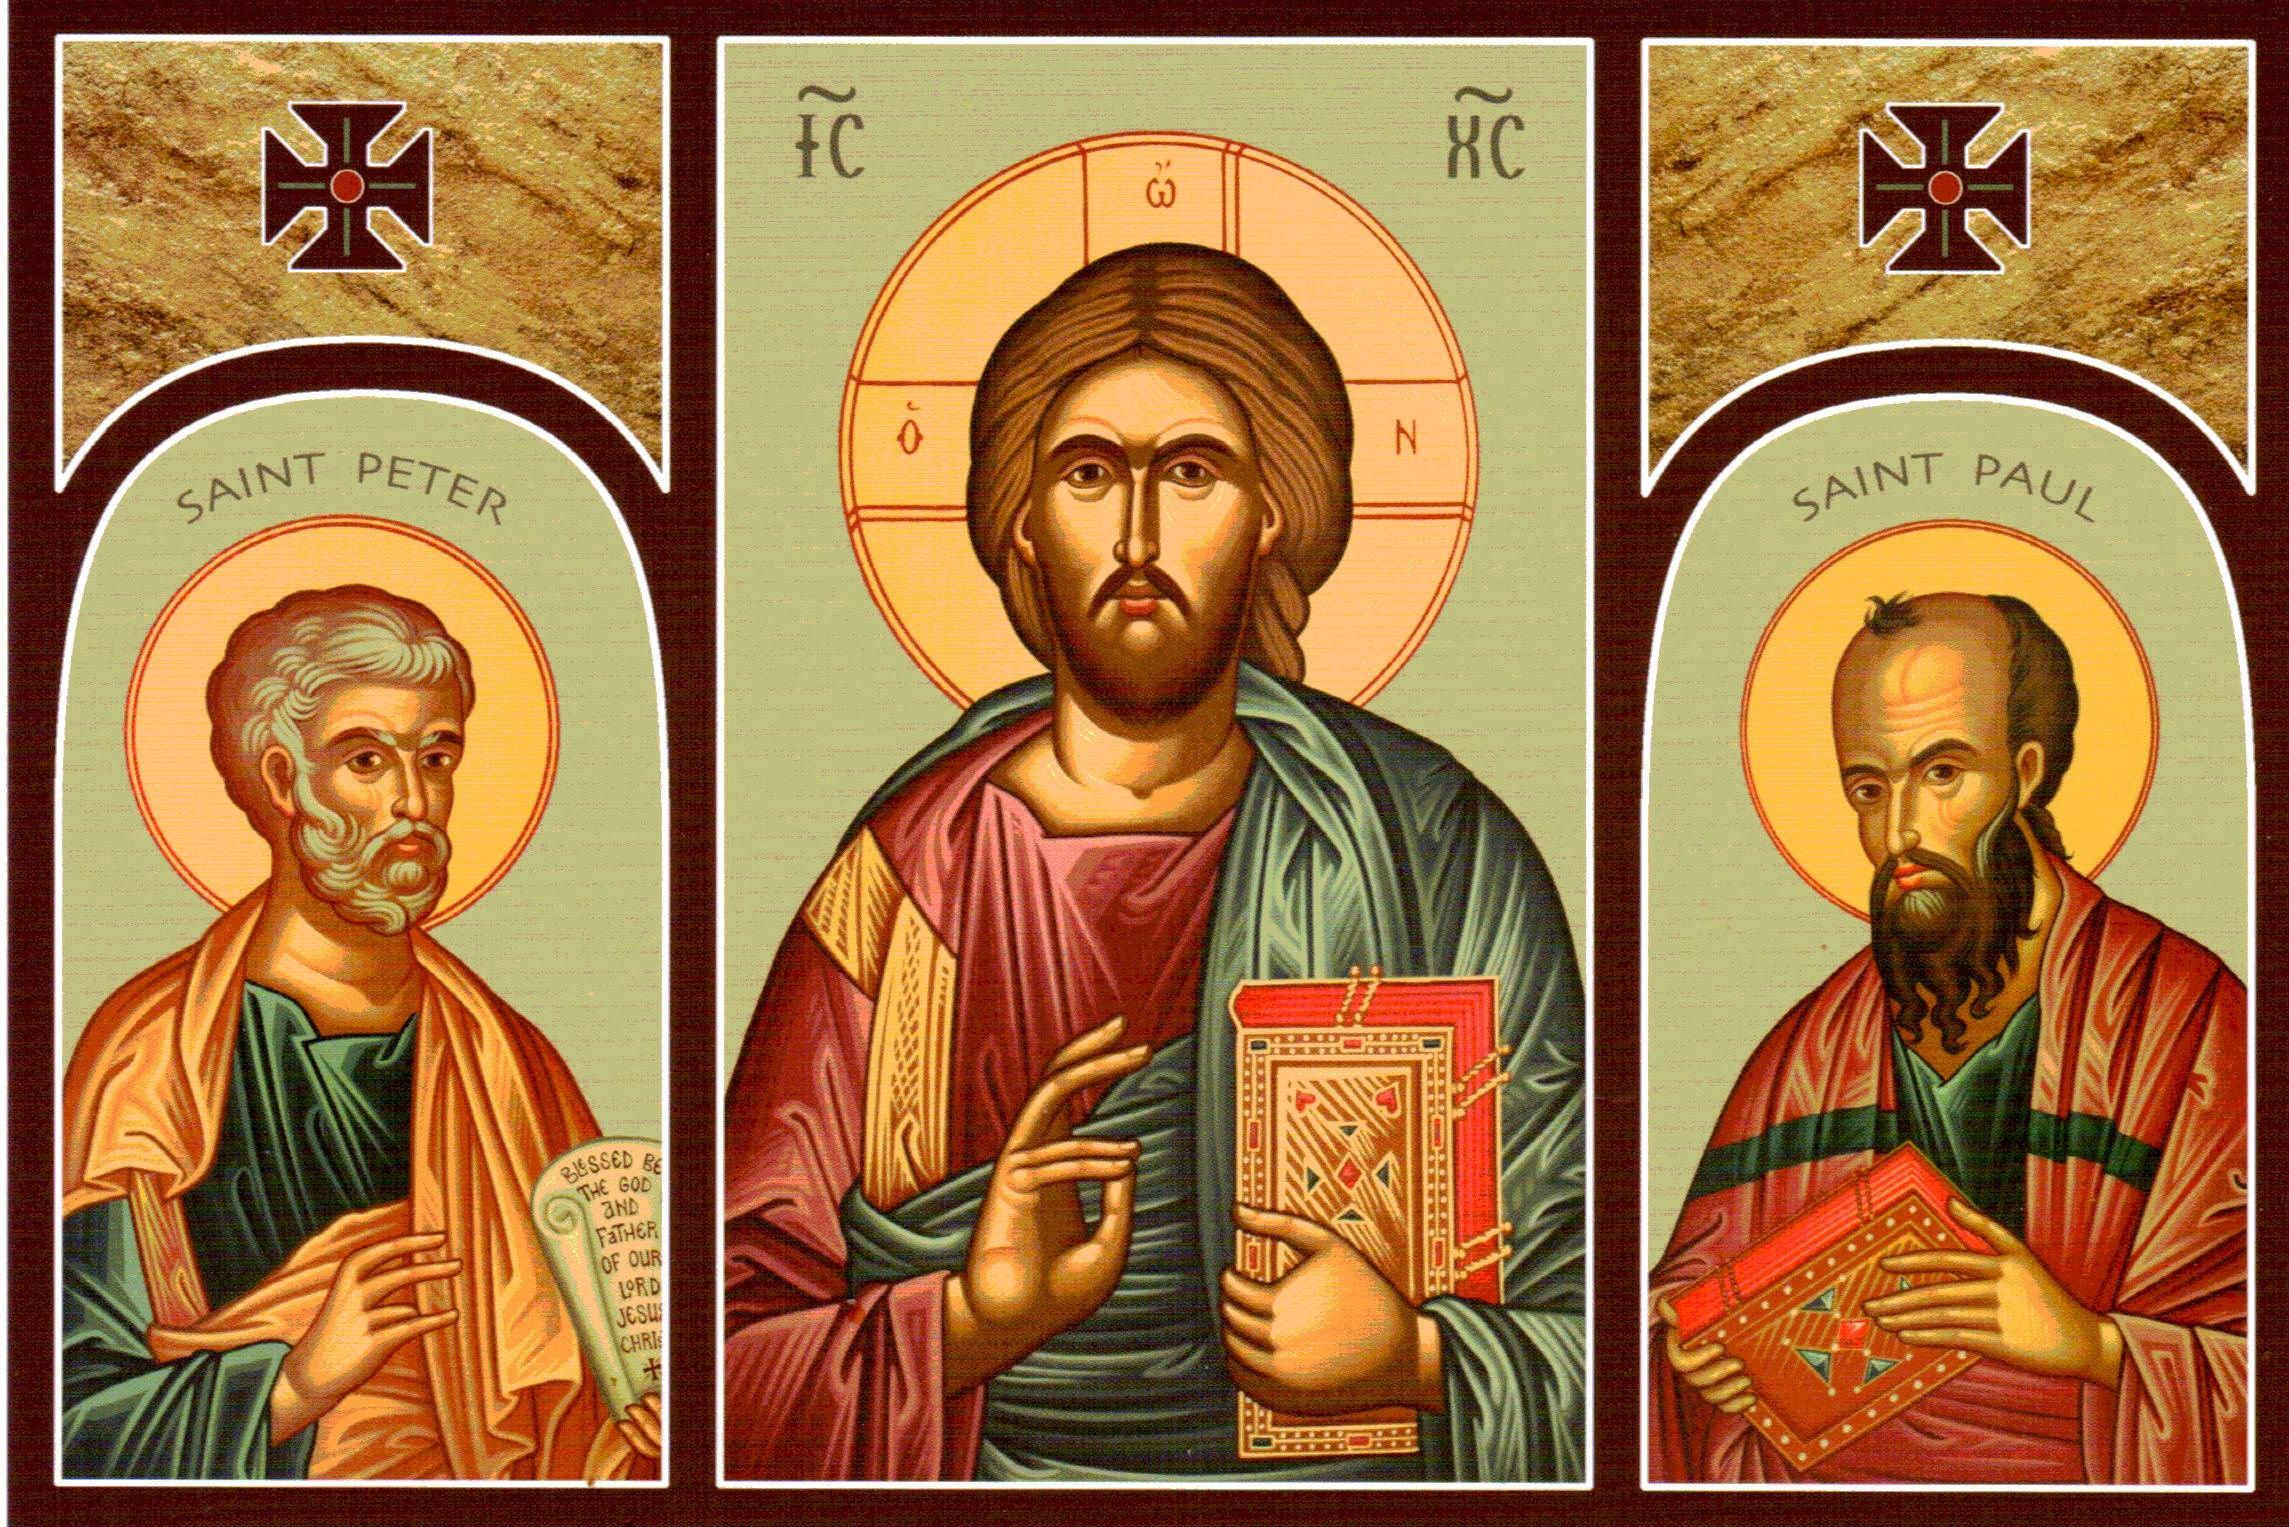 leo peter & Paul November 18 martyrs apostles martyrdom